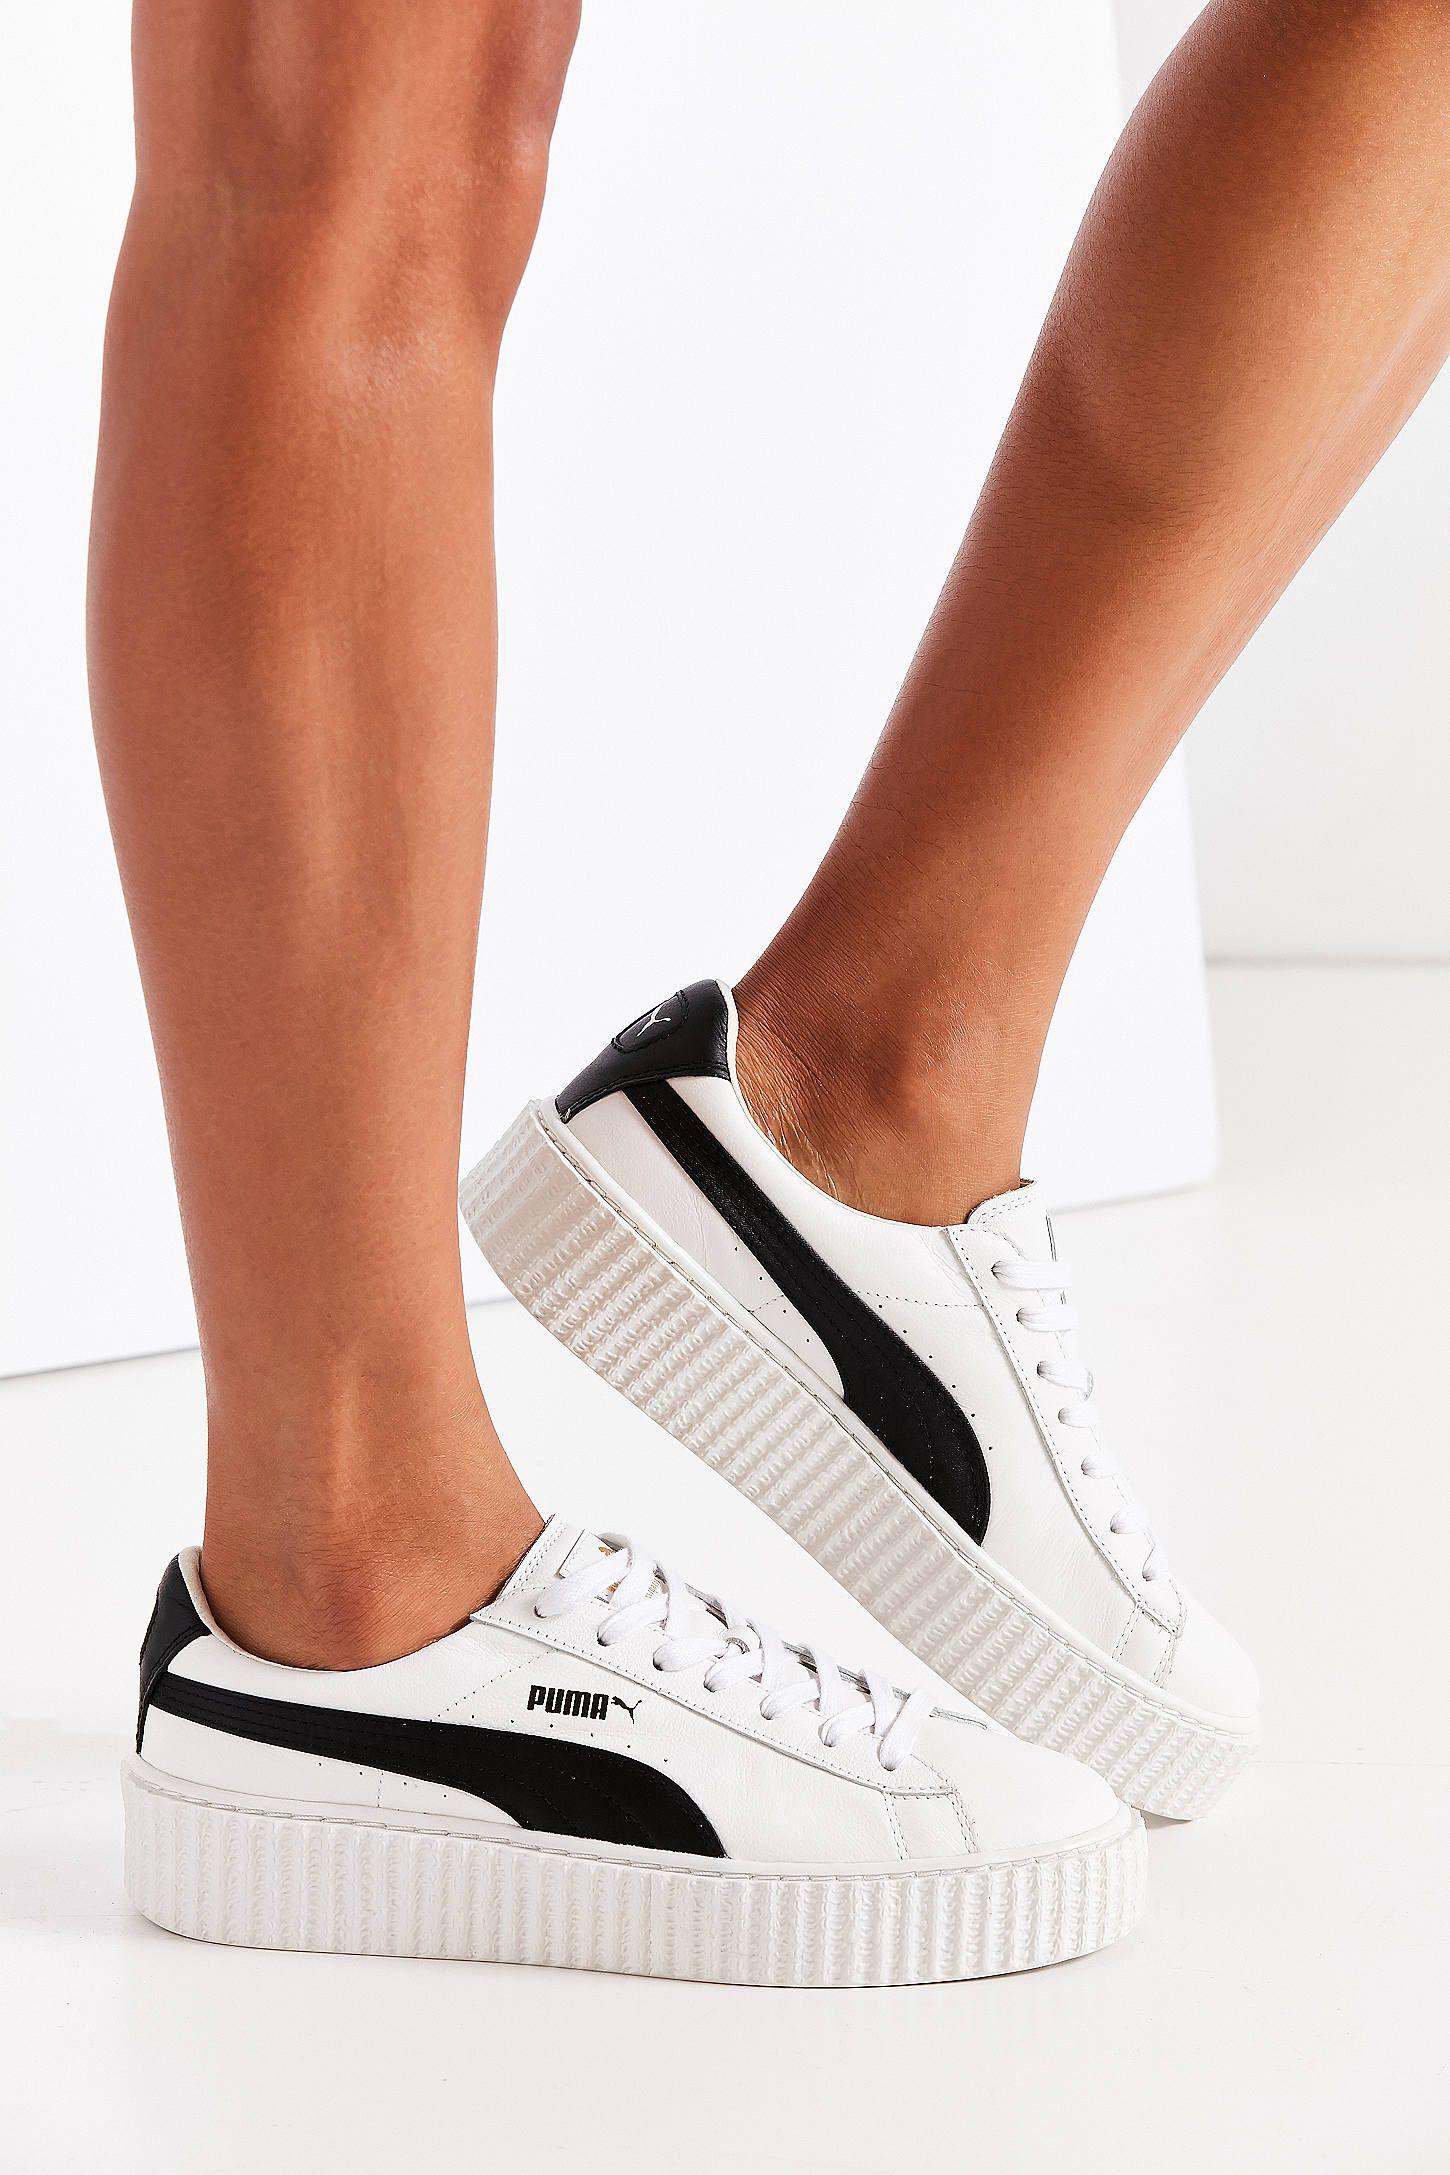 f6a086cc2 Puma Fenty by Rihanna Cracked Creeper Sneaker | shoes | Creeper ...